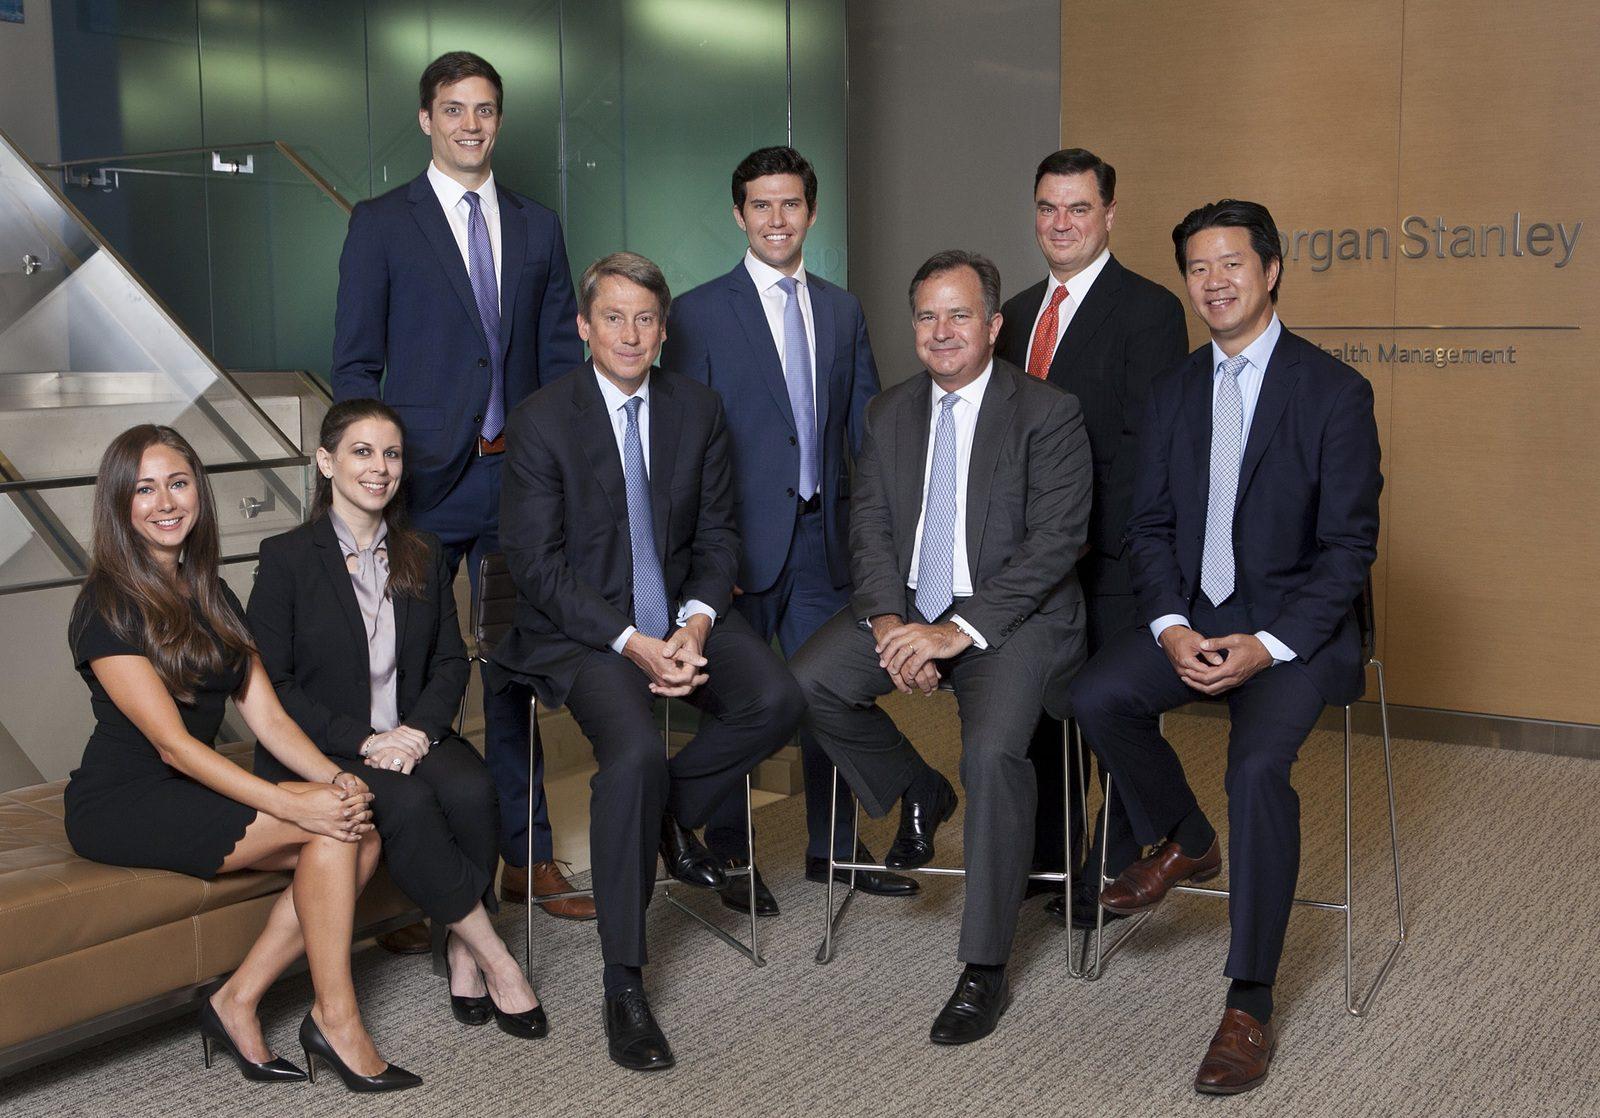 Morgan Stanley Management